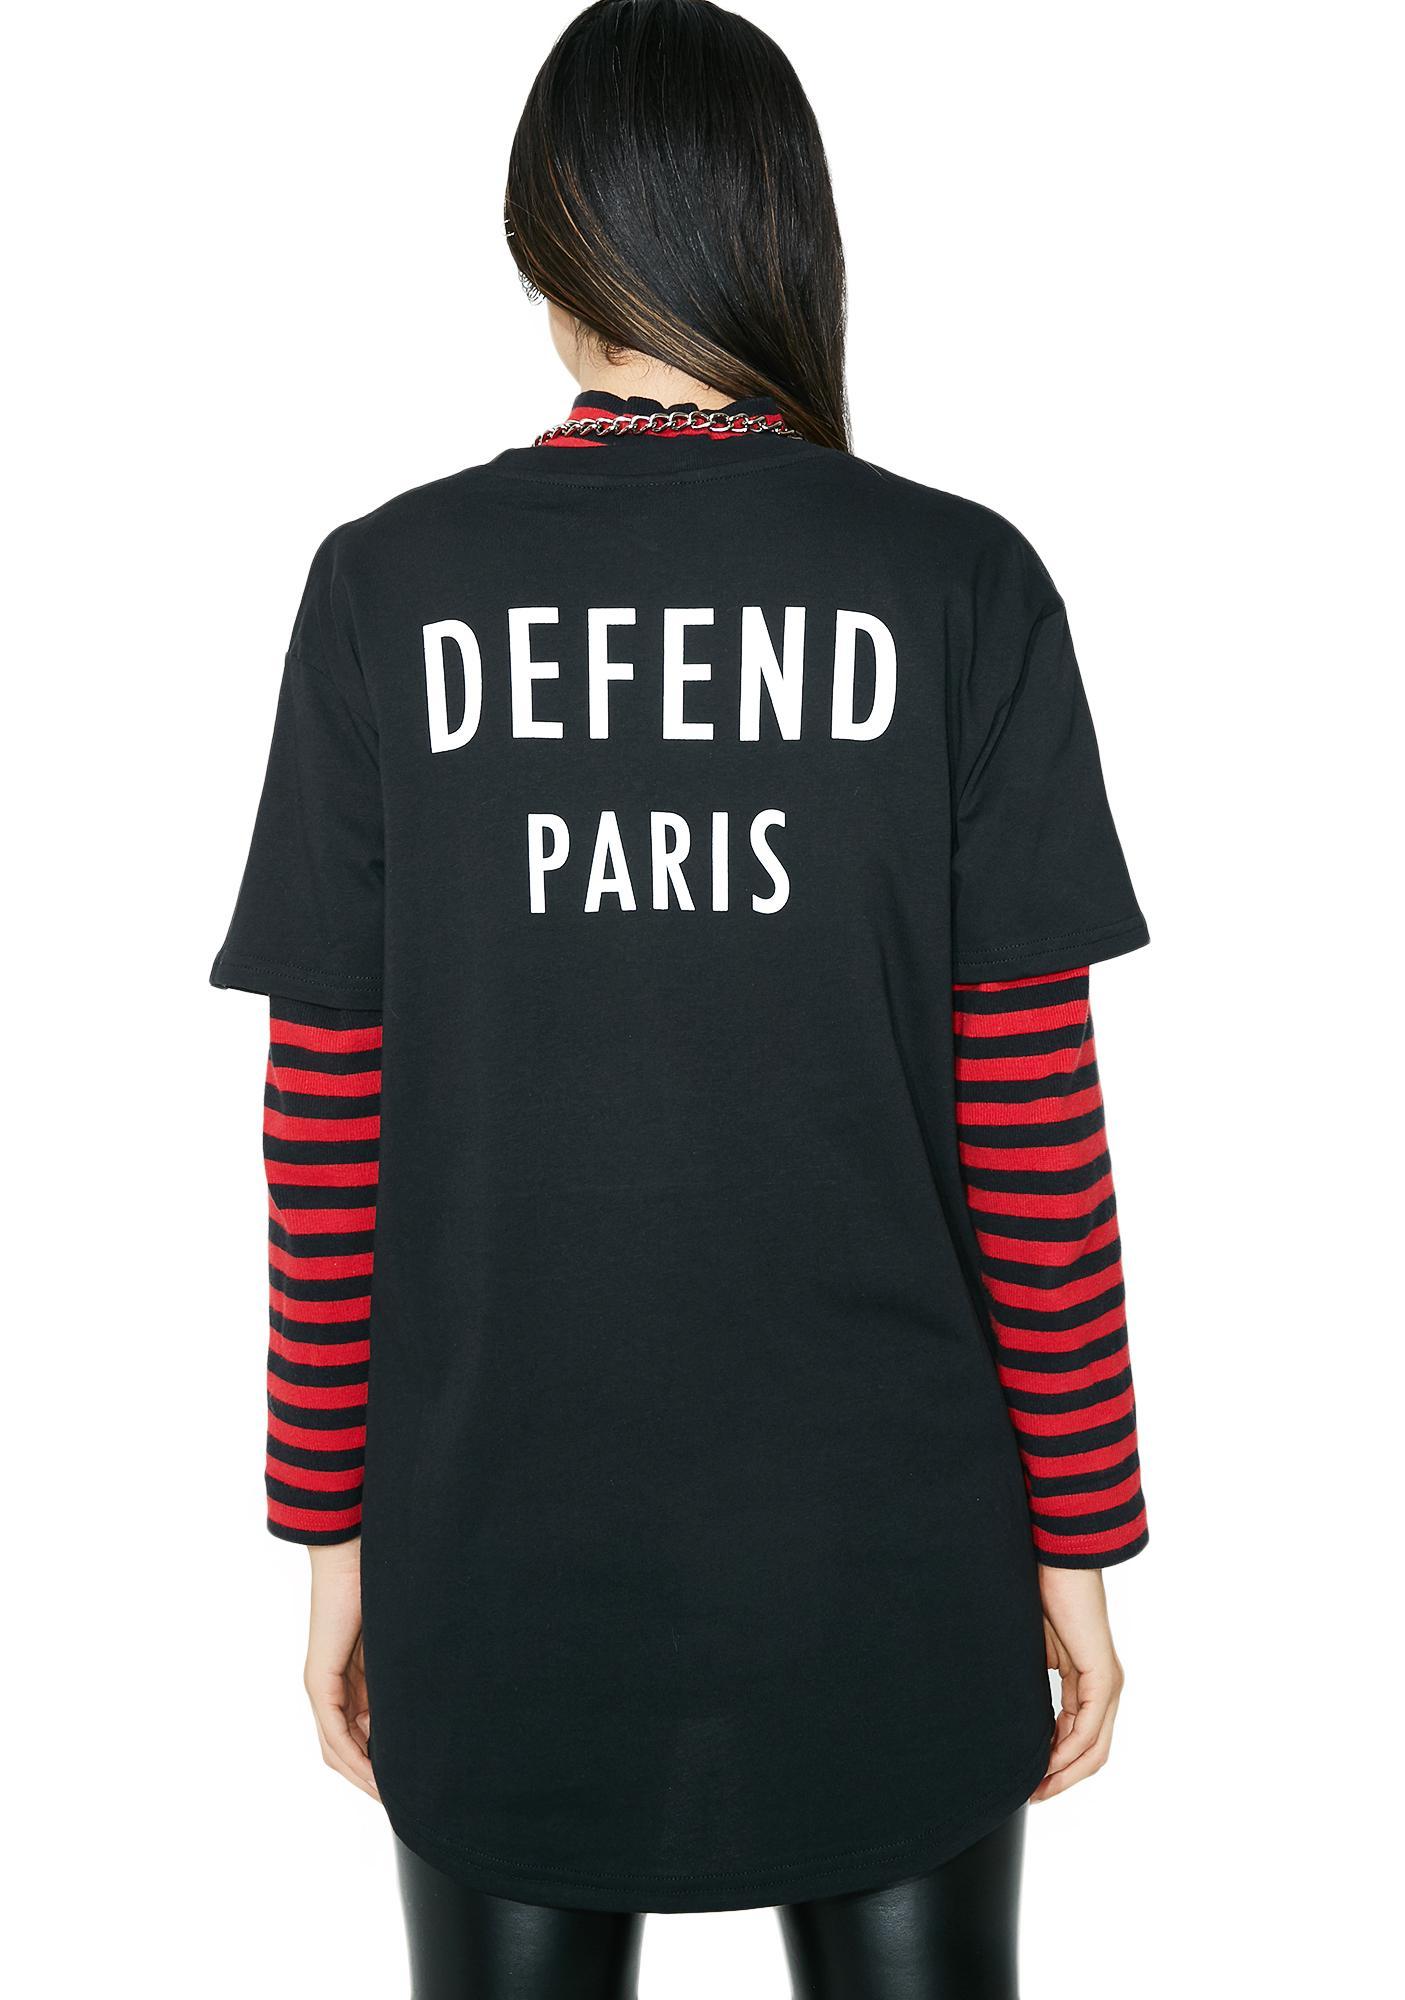 Defend Paris Toby Tee